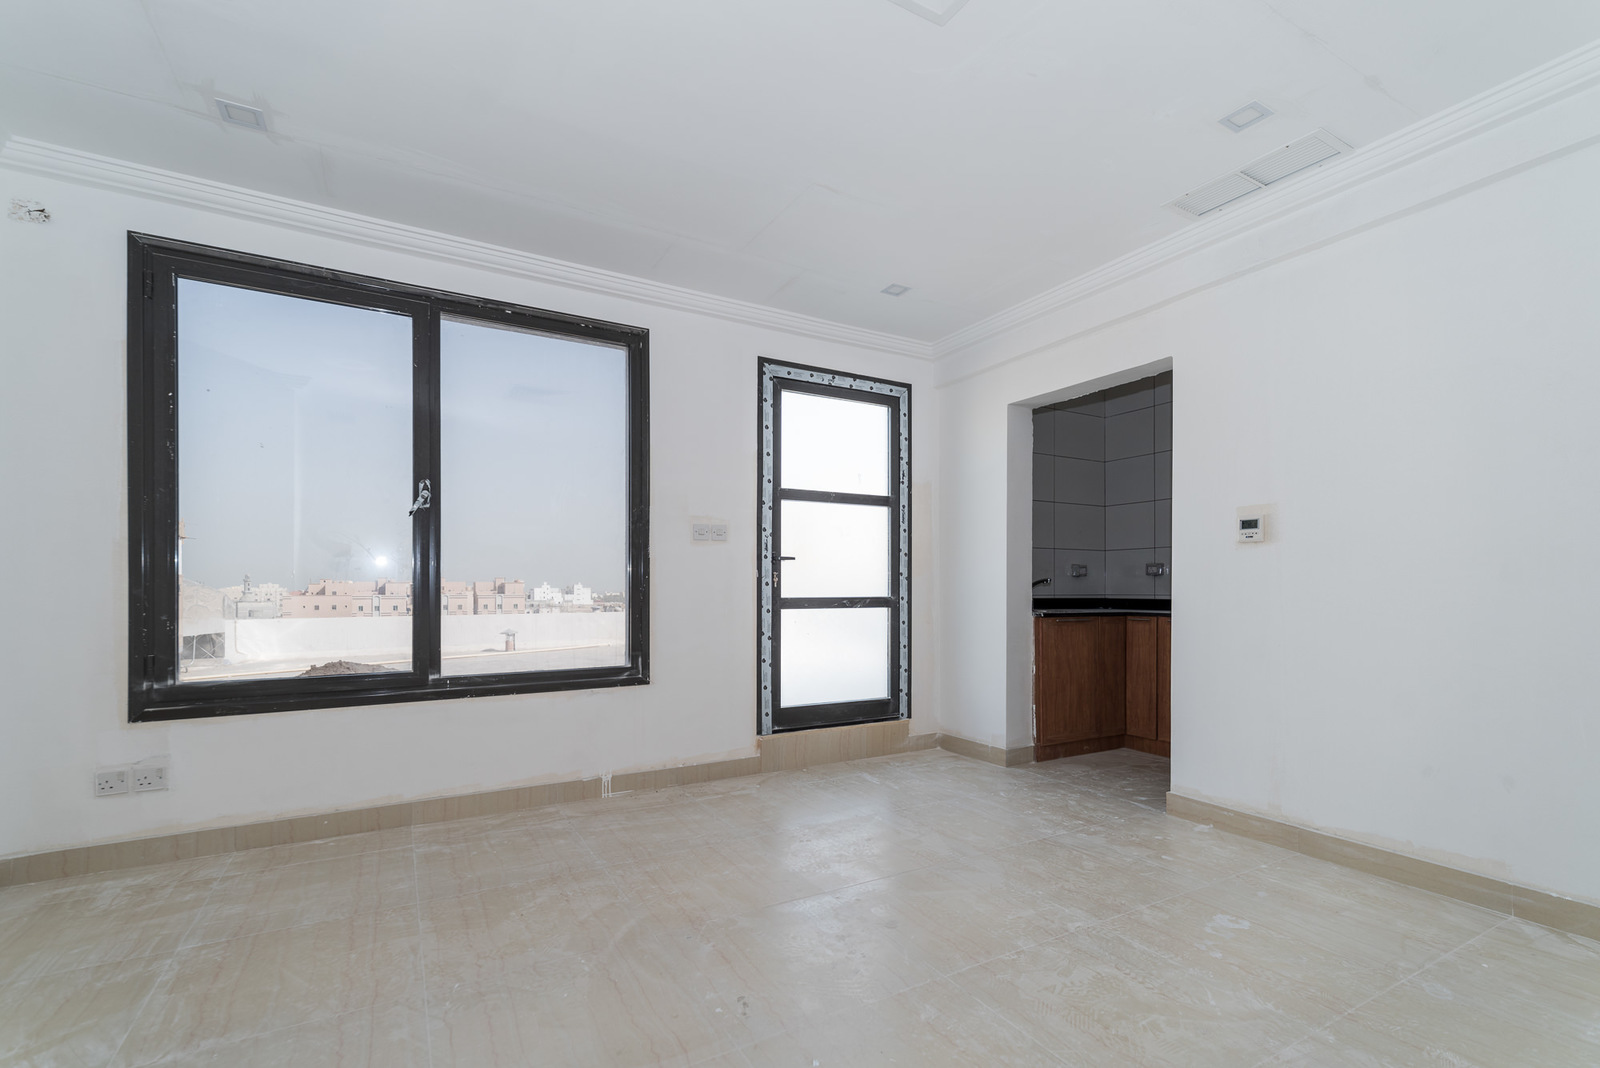 Abu Fatira – new, unfurnished, studio apartments